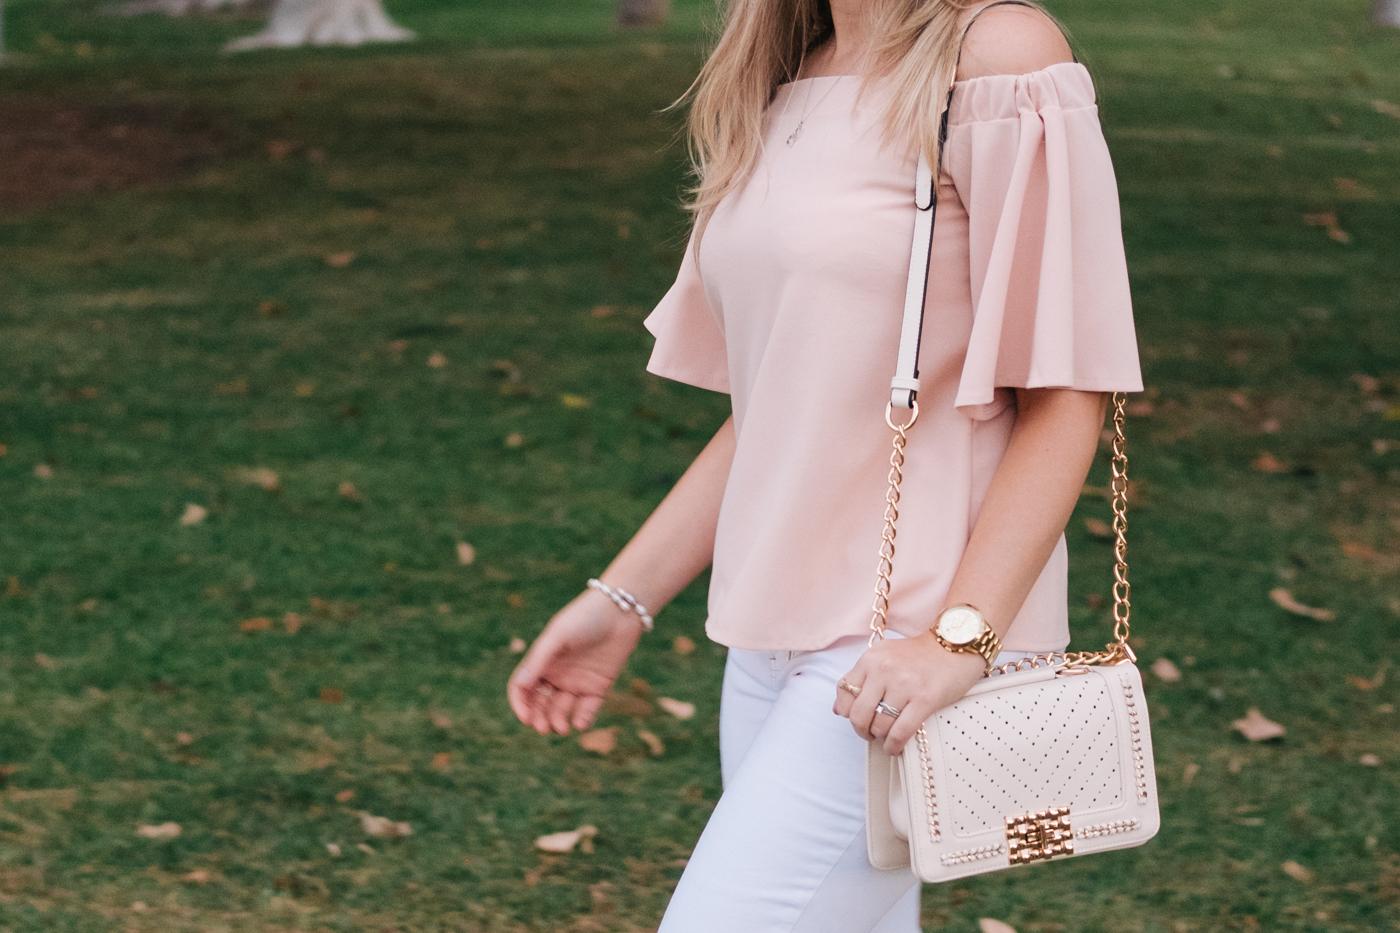 Debora Dahl wearing dresslily off the shoulder pink top